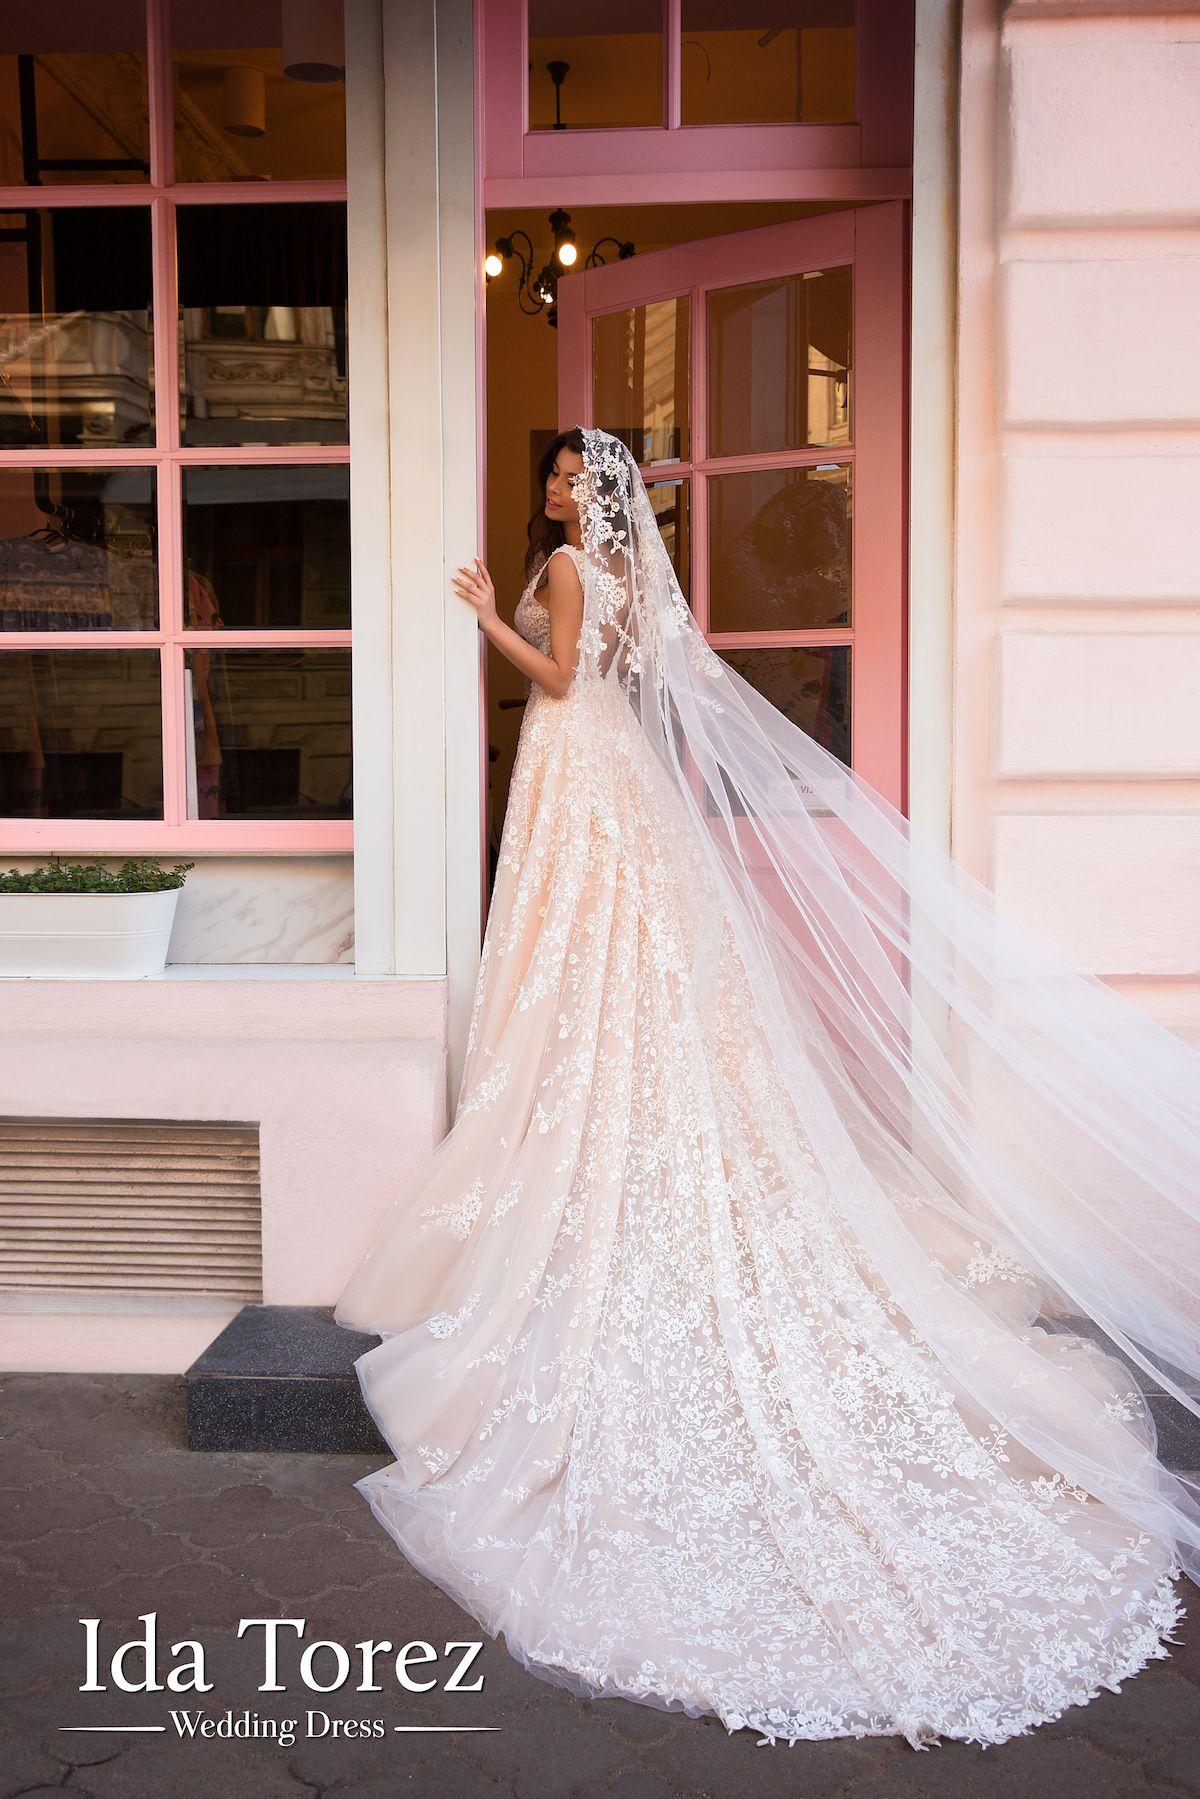 Wedding Dresses 01161 Rapana Venosa Pollardifashiongroup Pollardi Svadebnoeplate Svadebnyjsalonmoskva Weddingforwa Dresses Wedding Dresses Bride Style